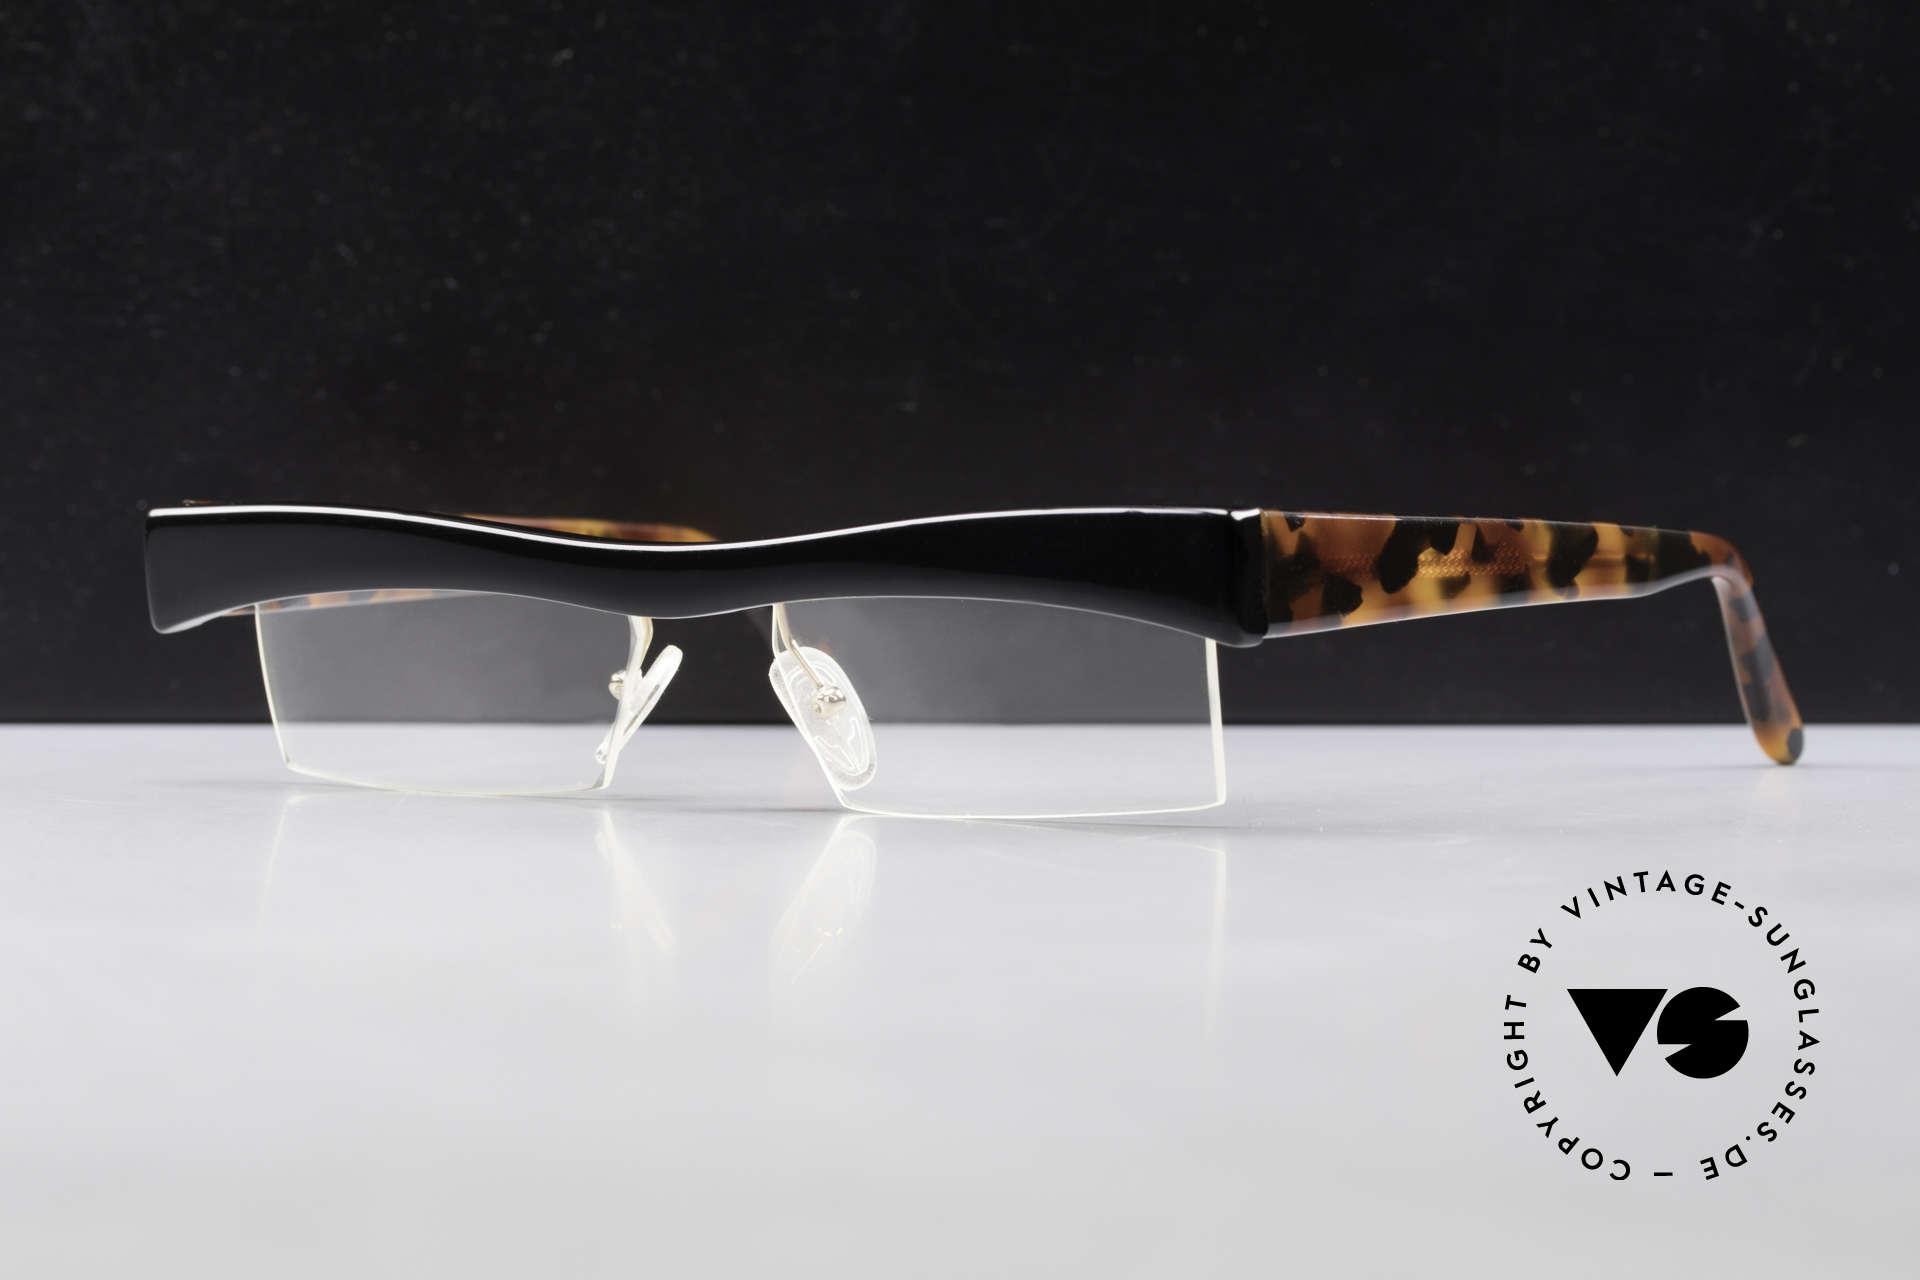 Design Maske Berlin Hamma Artful Vintage Eyeglasses 90s, rare, old vintage eyeglasses by Design Maske Berlin, Made for Men